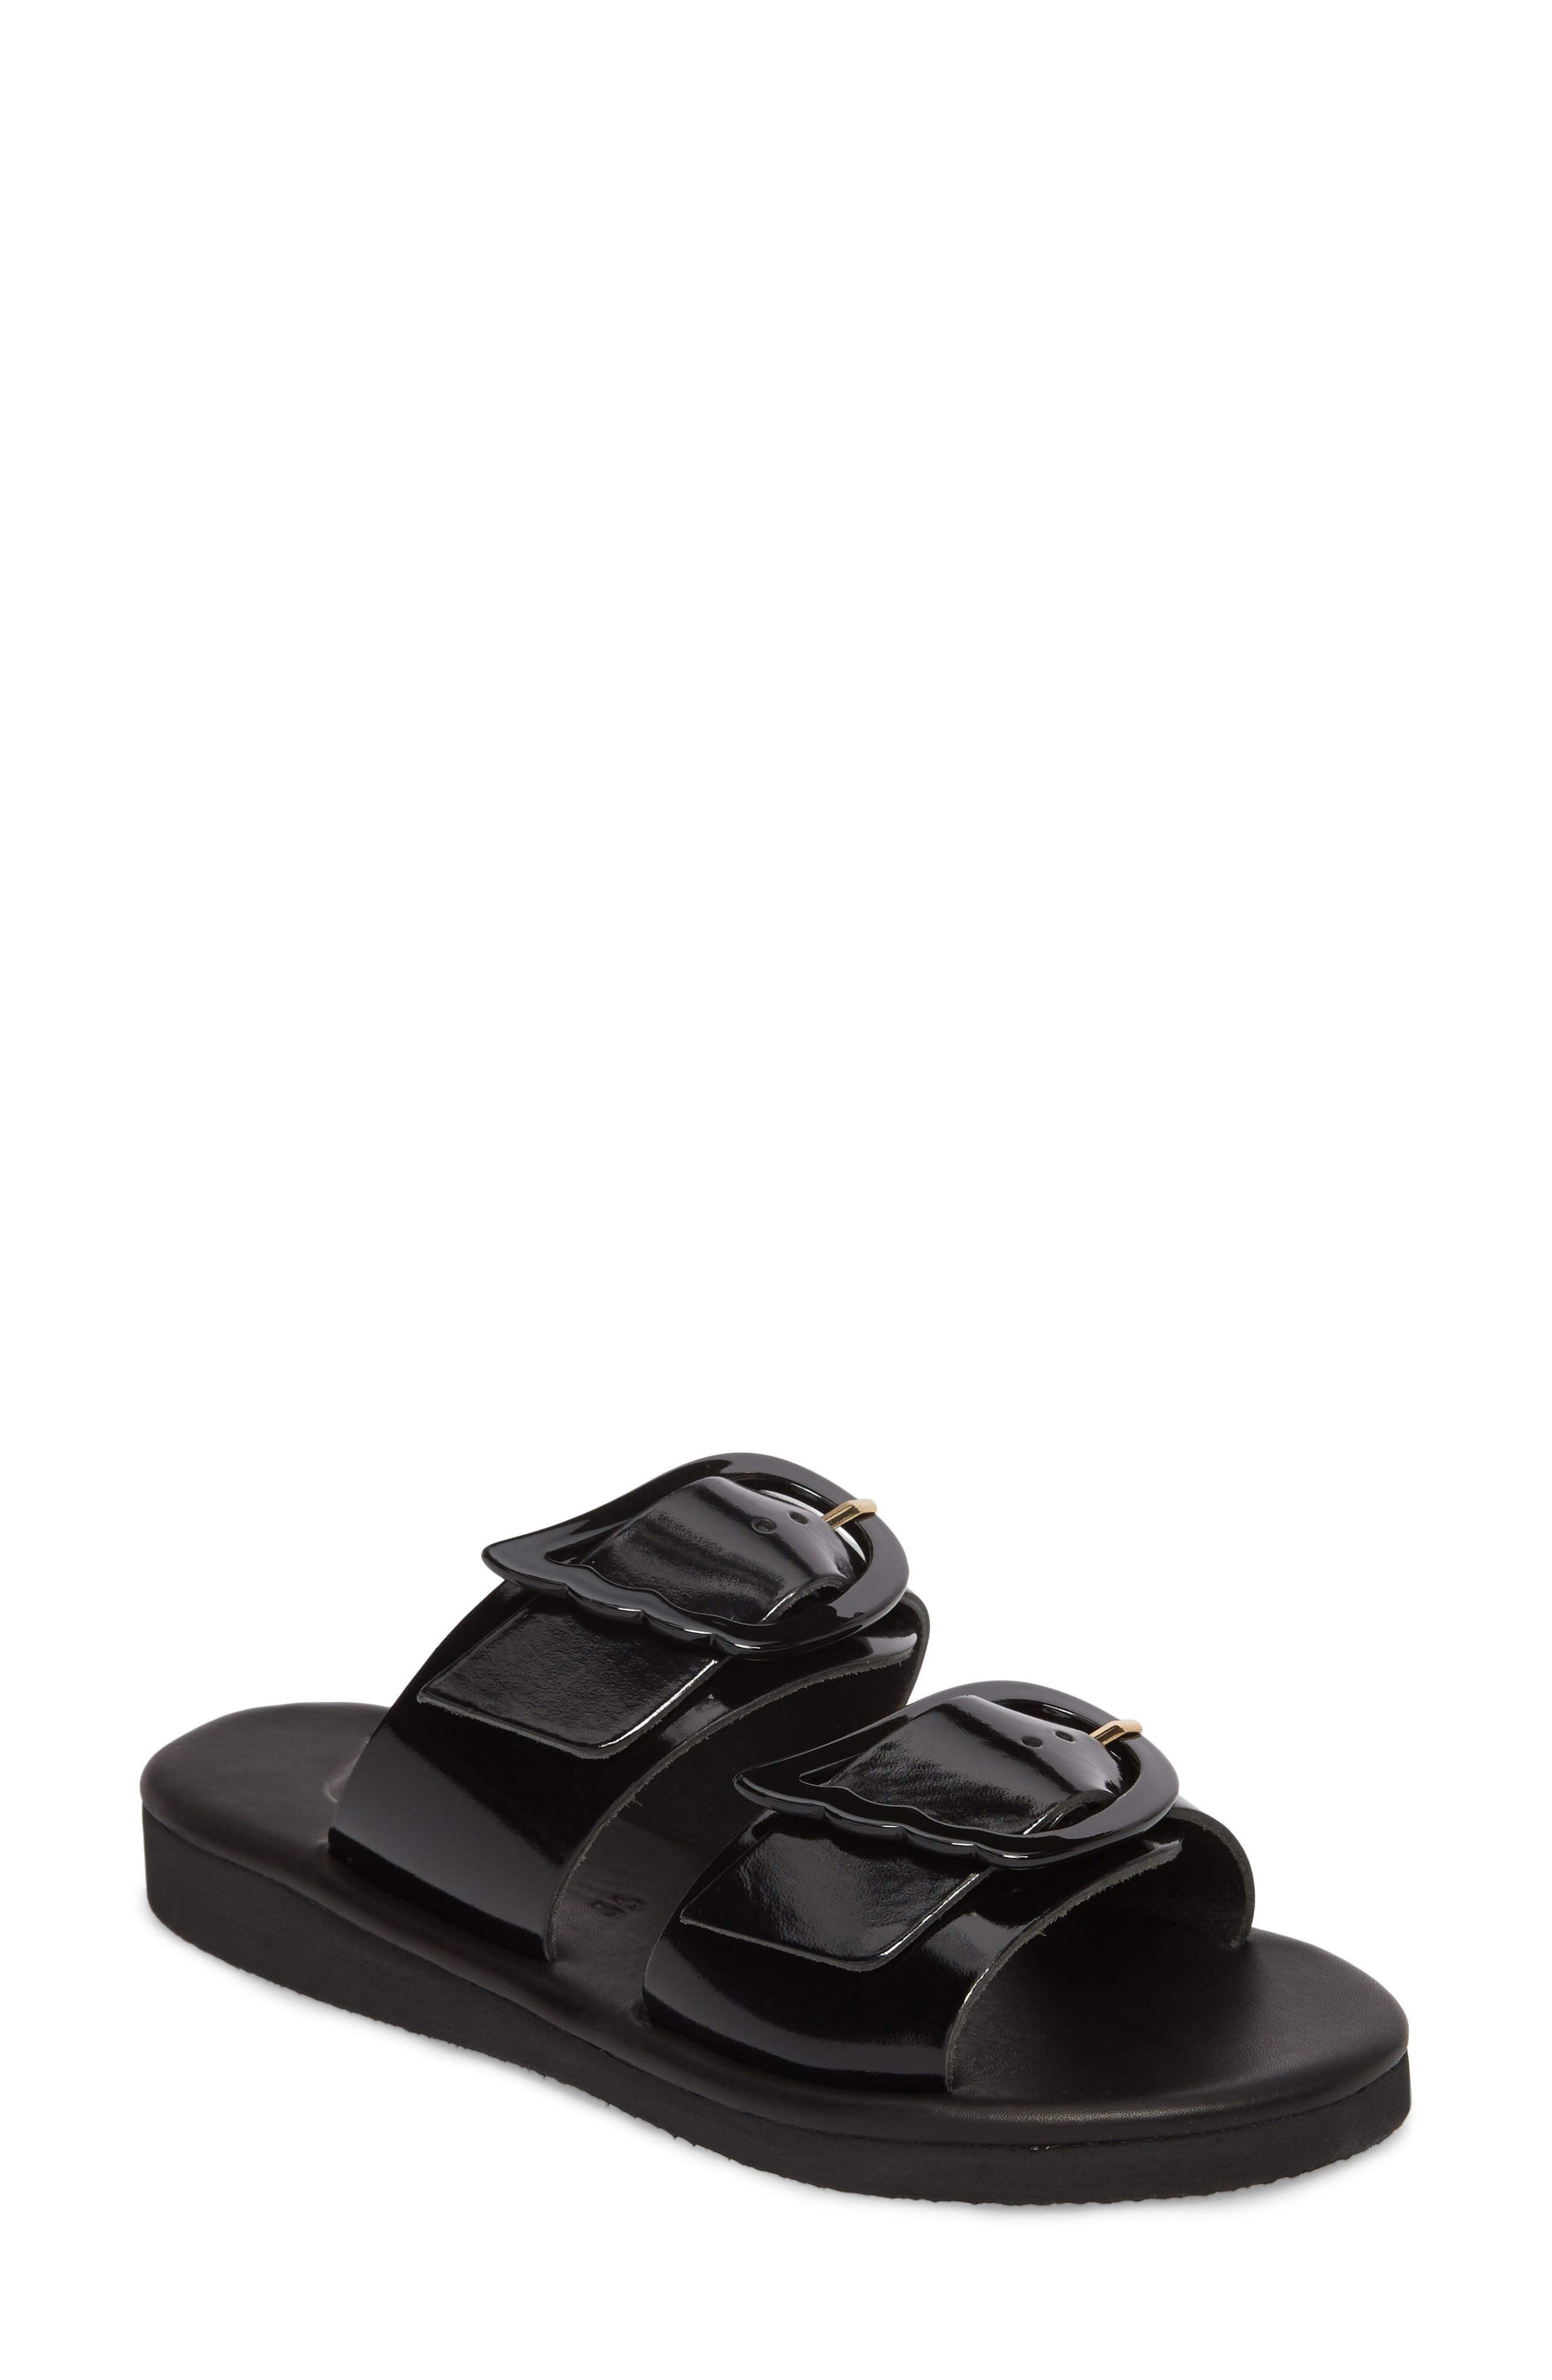 Main Image - Ancient Greek Sandals Iaso Slide Sandal (Women)